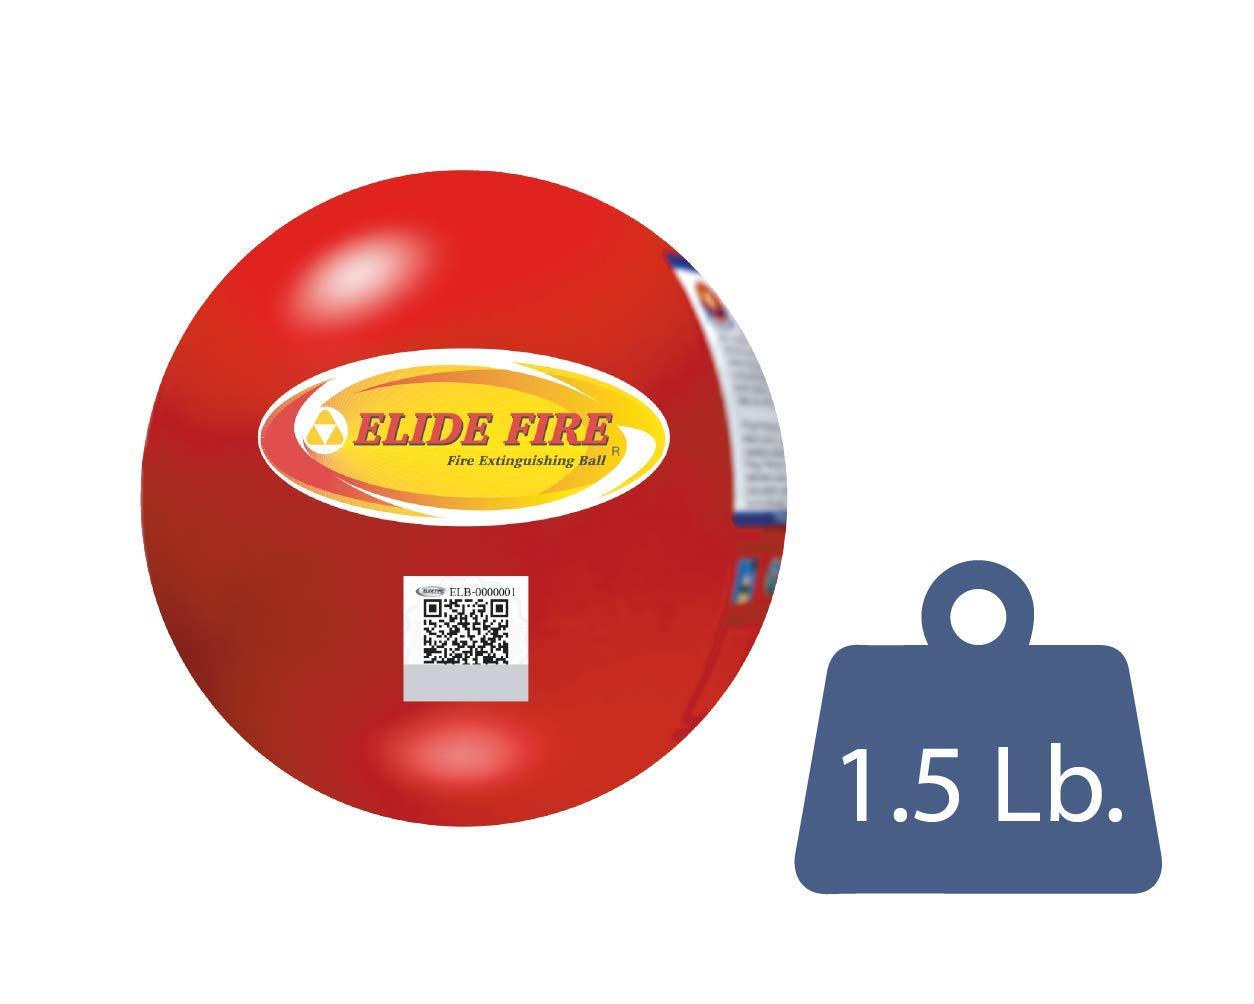 Mini ELIDE FIRE Extinguishing Ball Automatic Surveillance ...